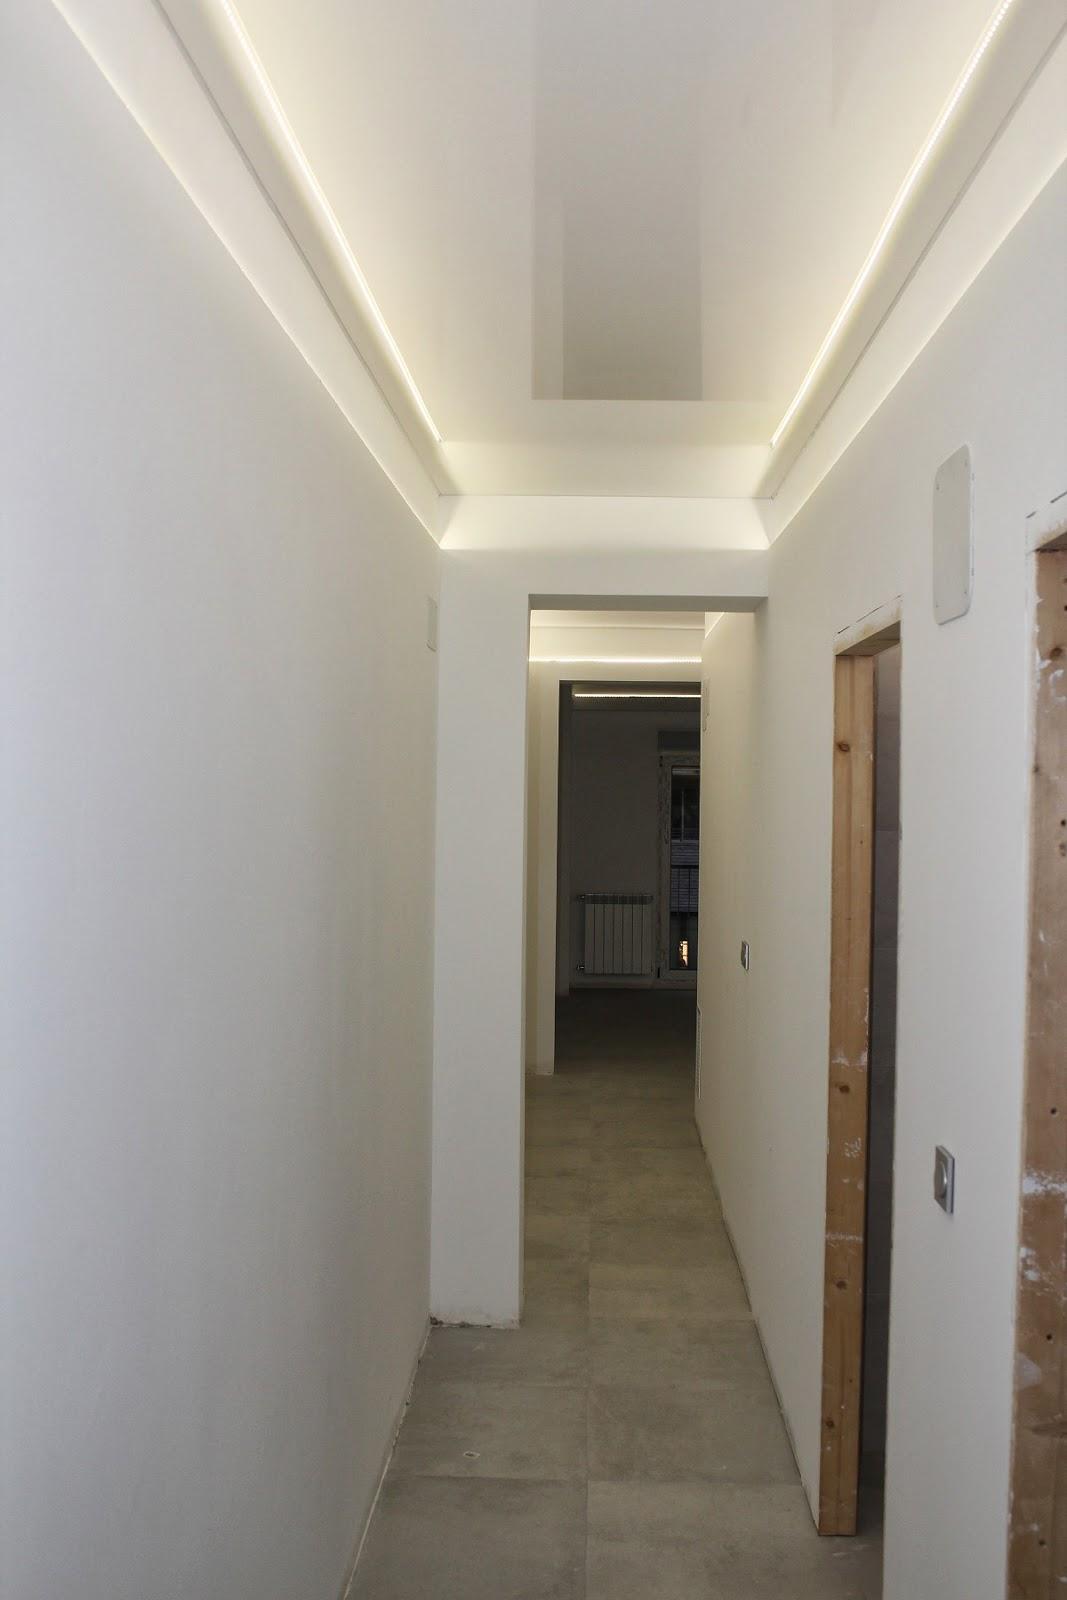 Aislamiento termico paredes interiores sin obra trendy aislamiento termico camara de aire with - Aislamiento paredes interiores ...